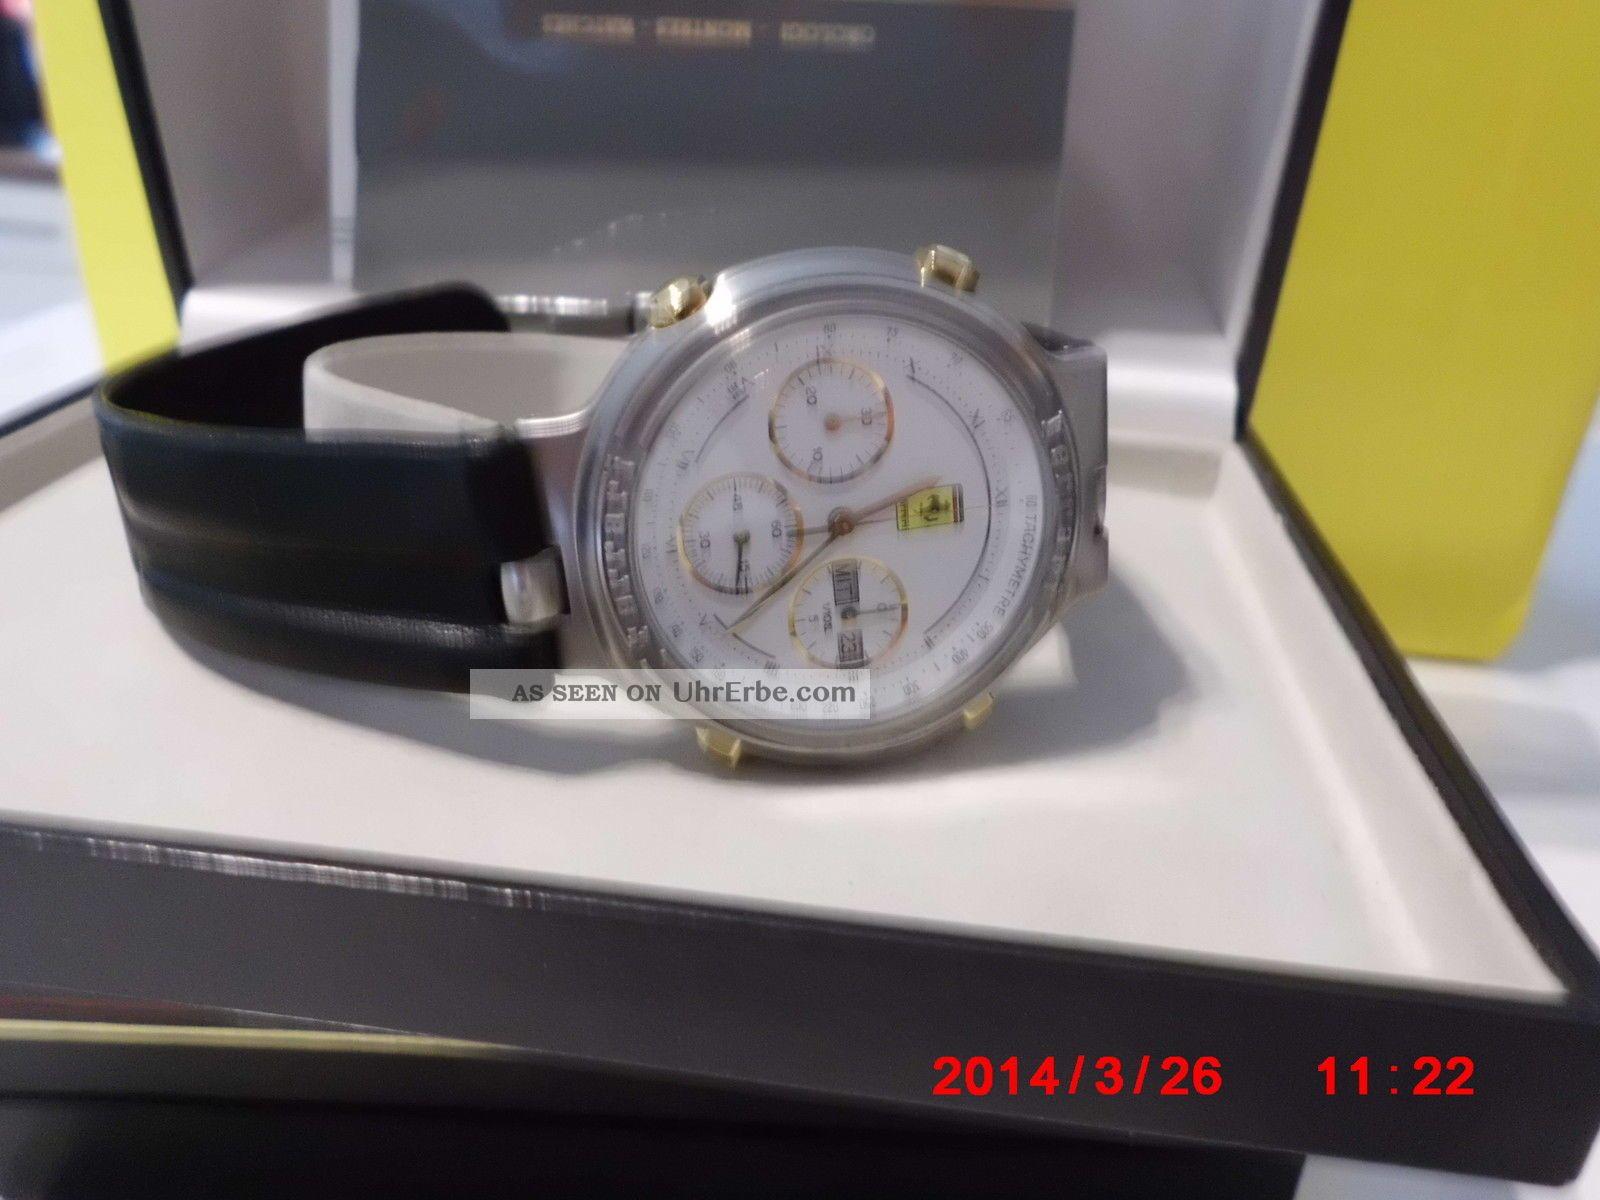 Ferrari Chronograph Uhr Formula Serie Hau Chrono Armbanduhren Bild